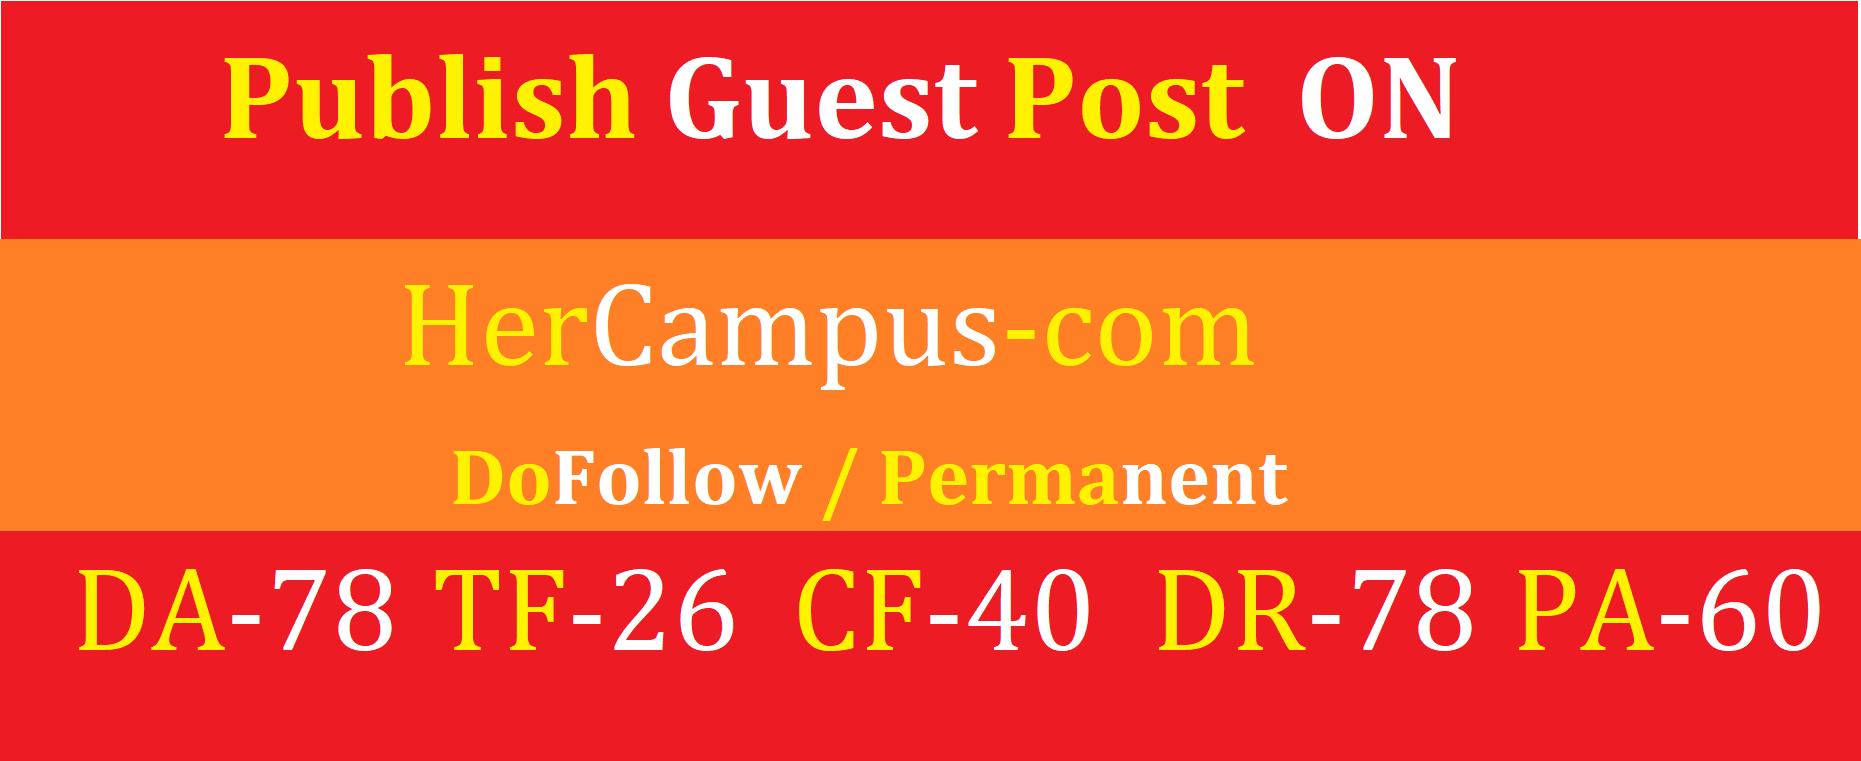 i will write & Publish guest post on hercampus. com da78 cf40 dr